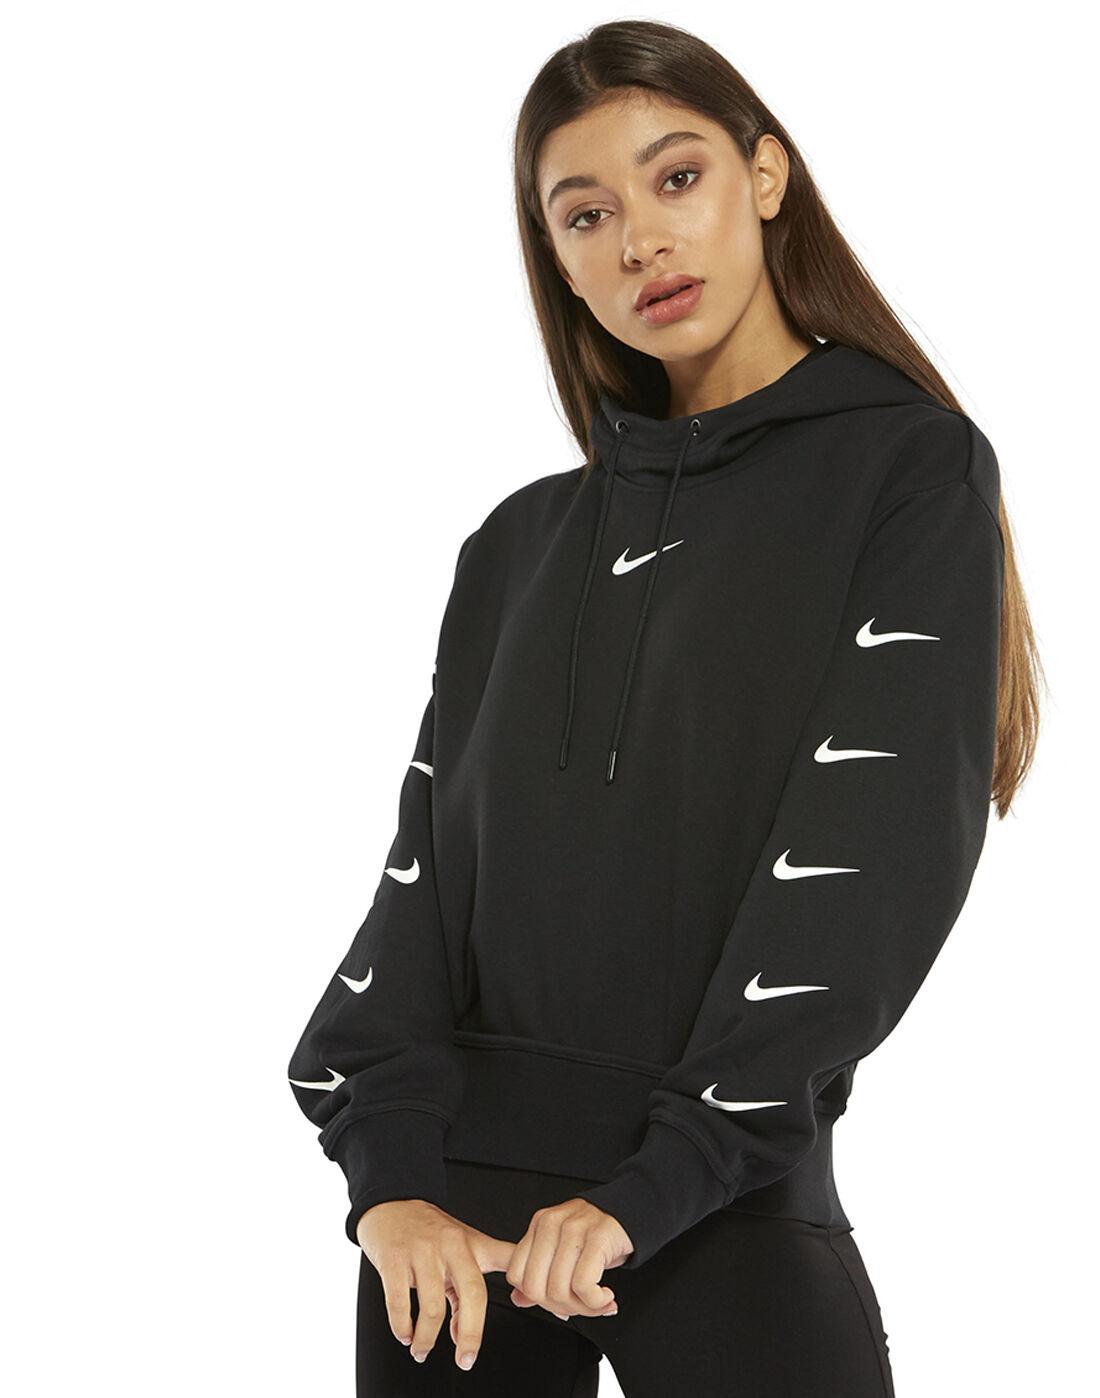 Women's Black Nike Swoosh Hoodie   Life